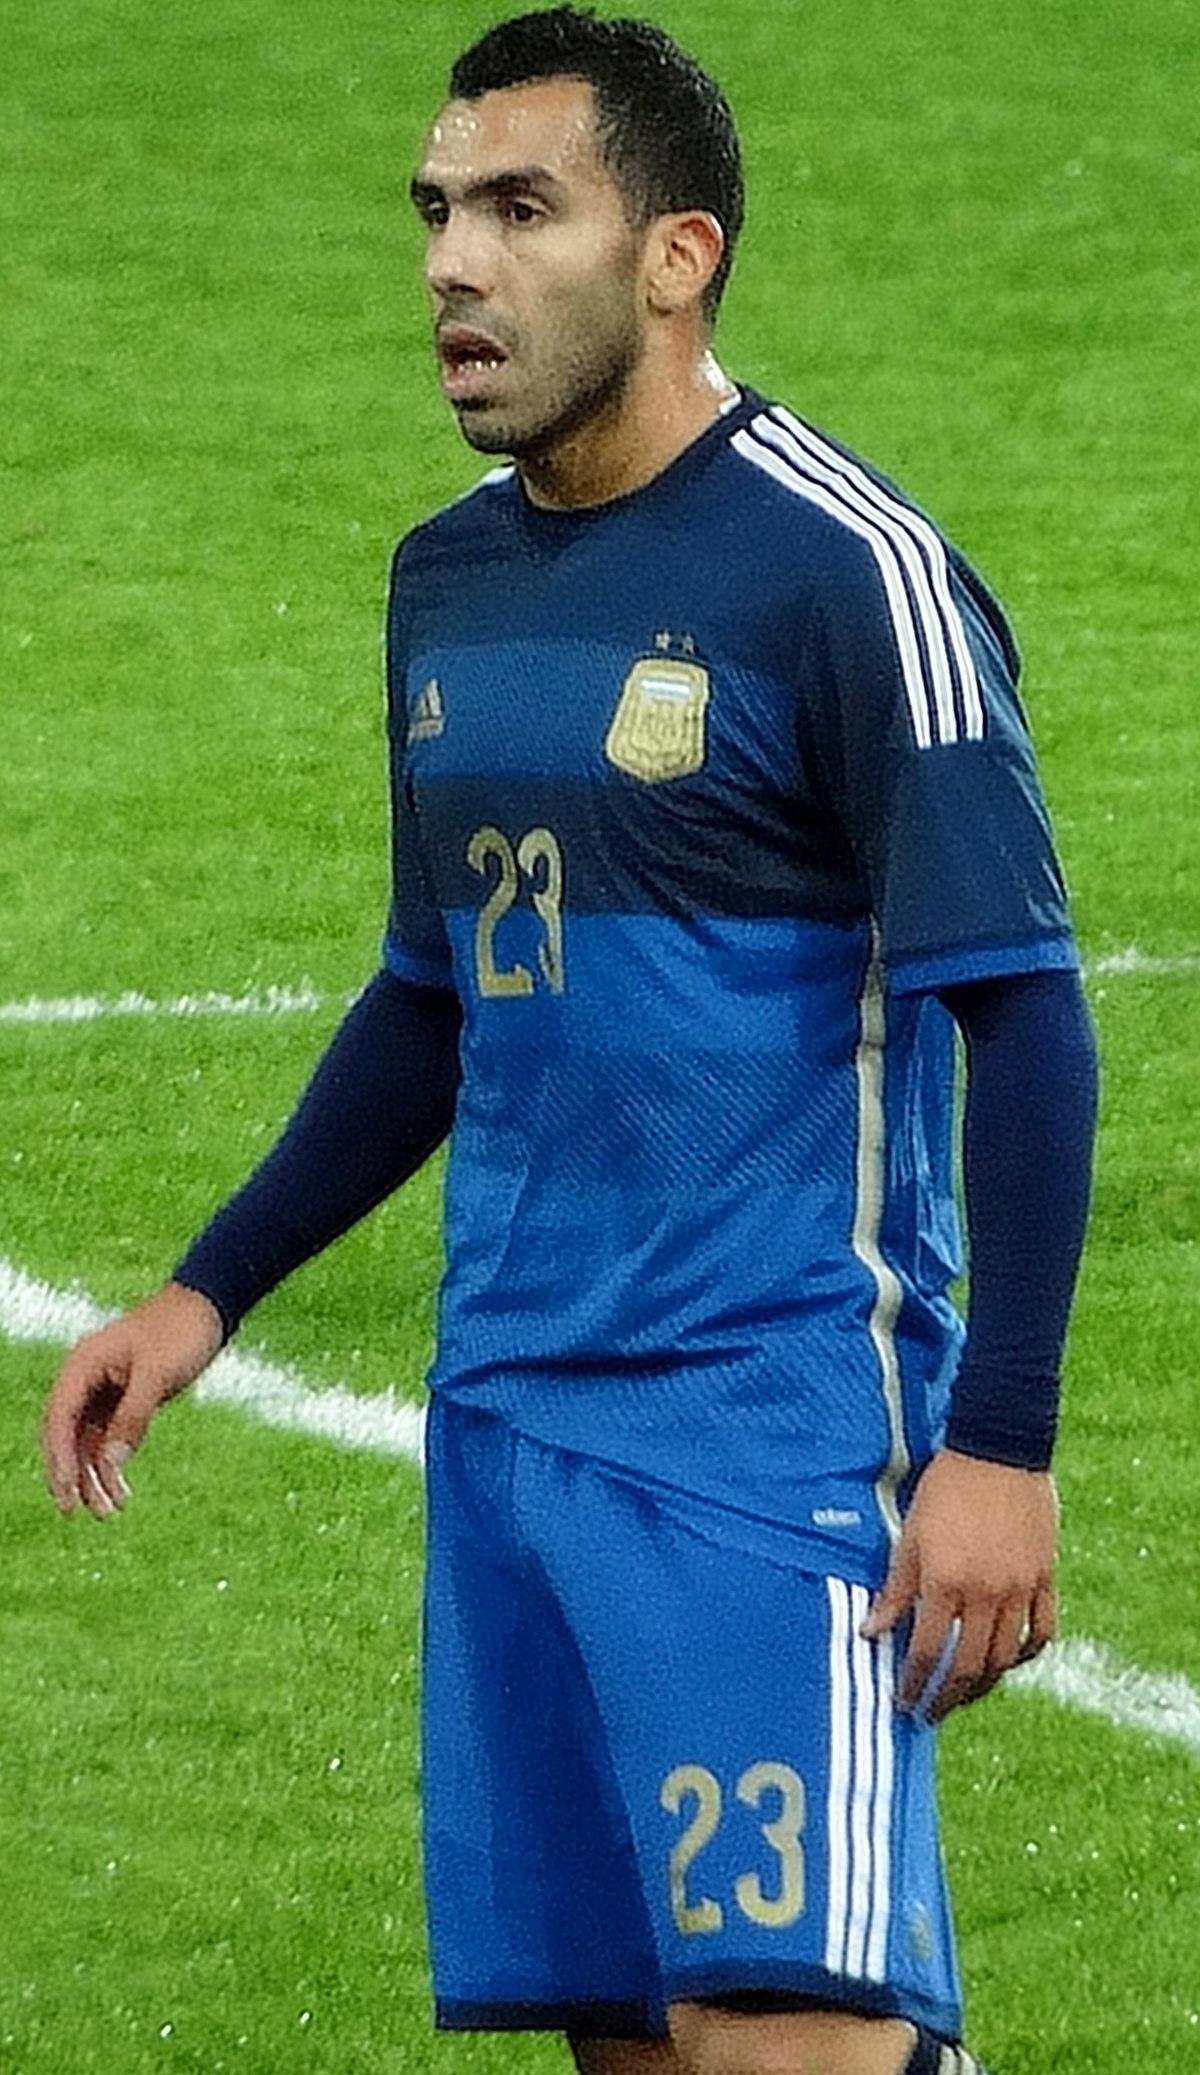 1bbad17e95d Carlos Tevez - Wikipedia